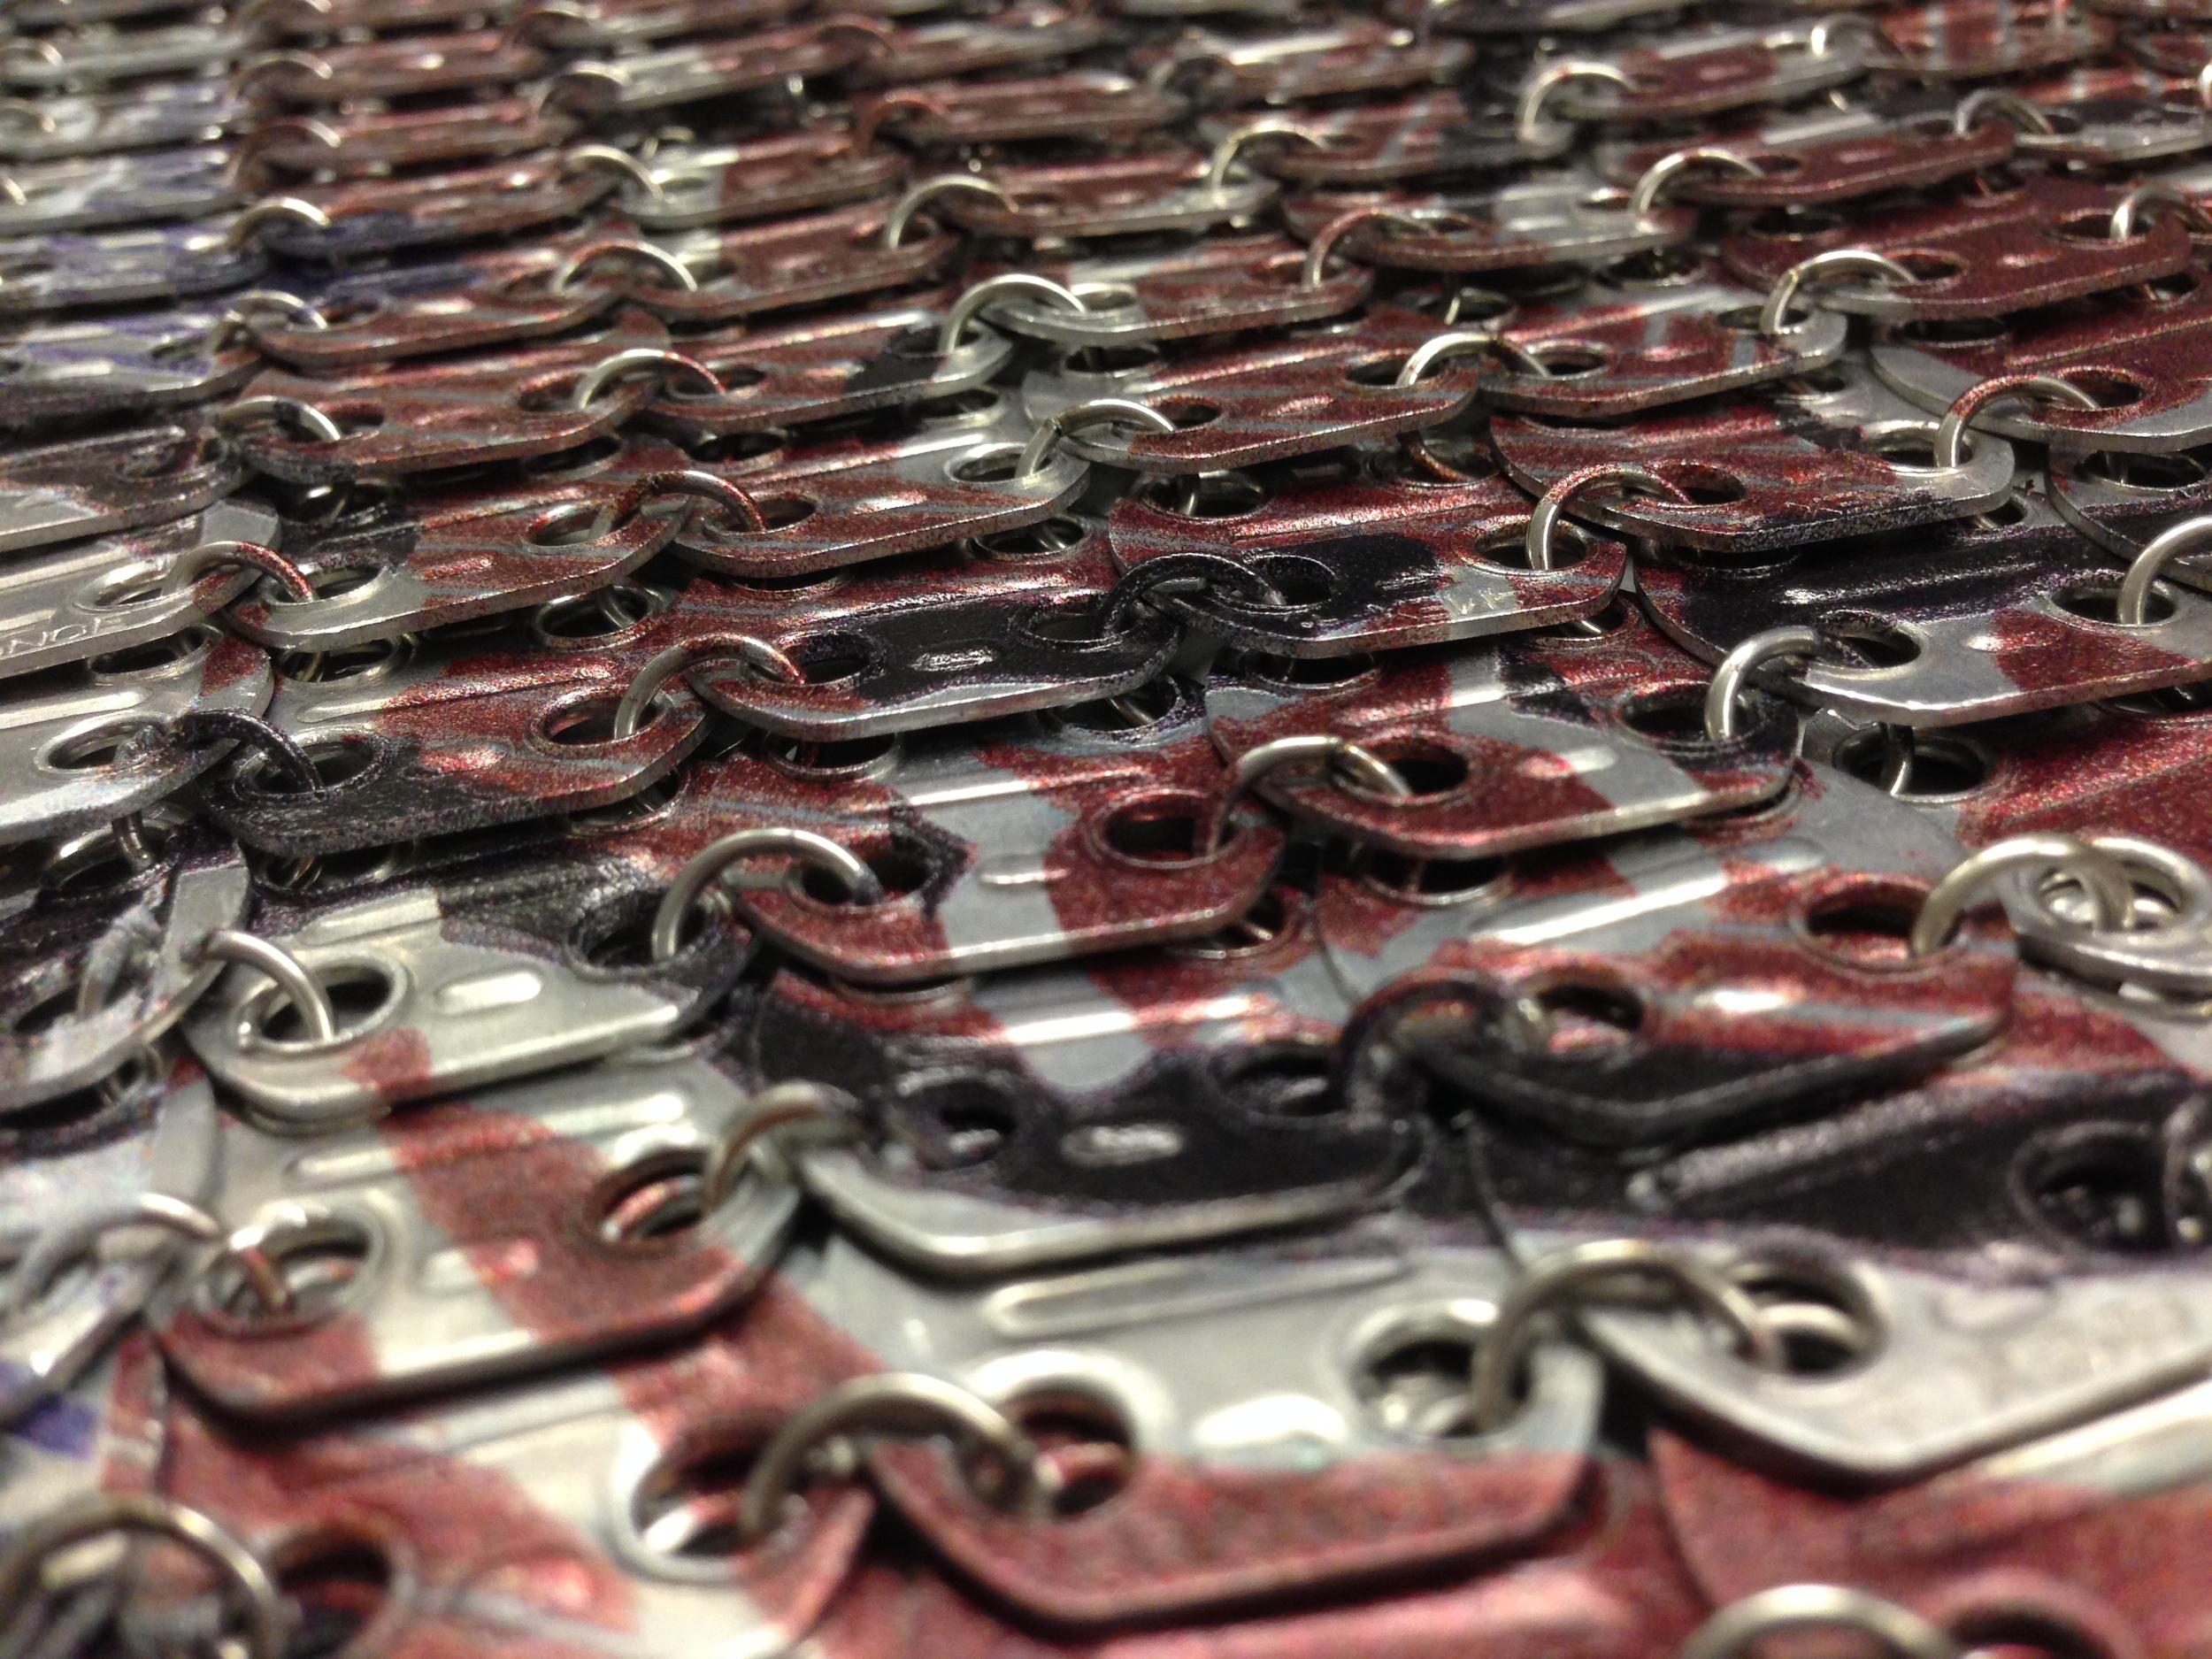 mary katrantzou flatbed printing